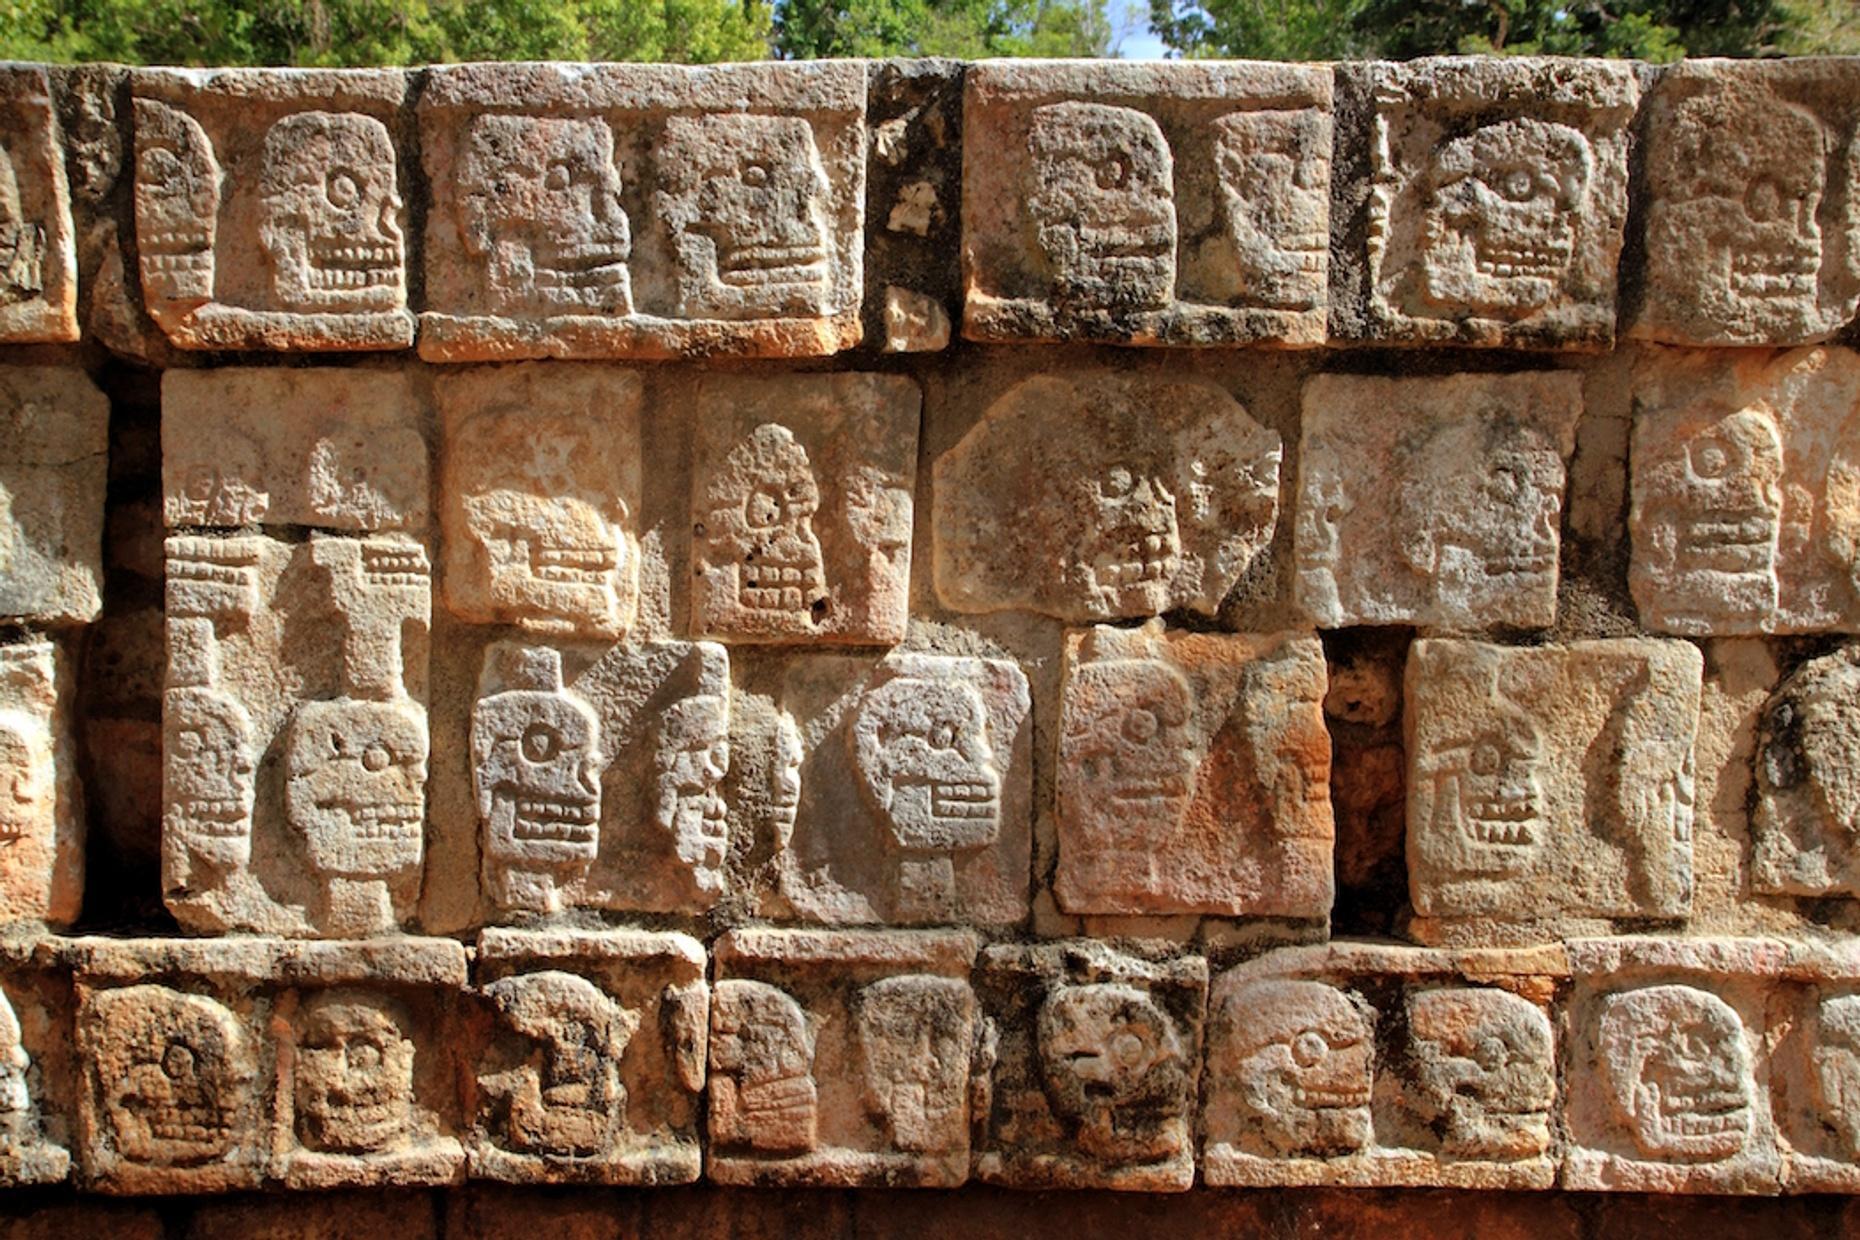 In-Depth Tour of Chichén Itzá in Spanish